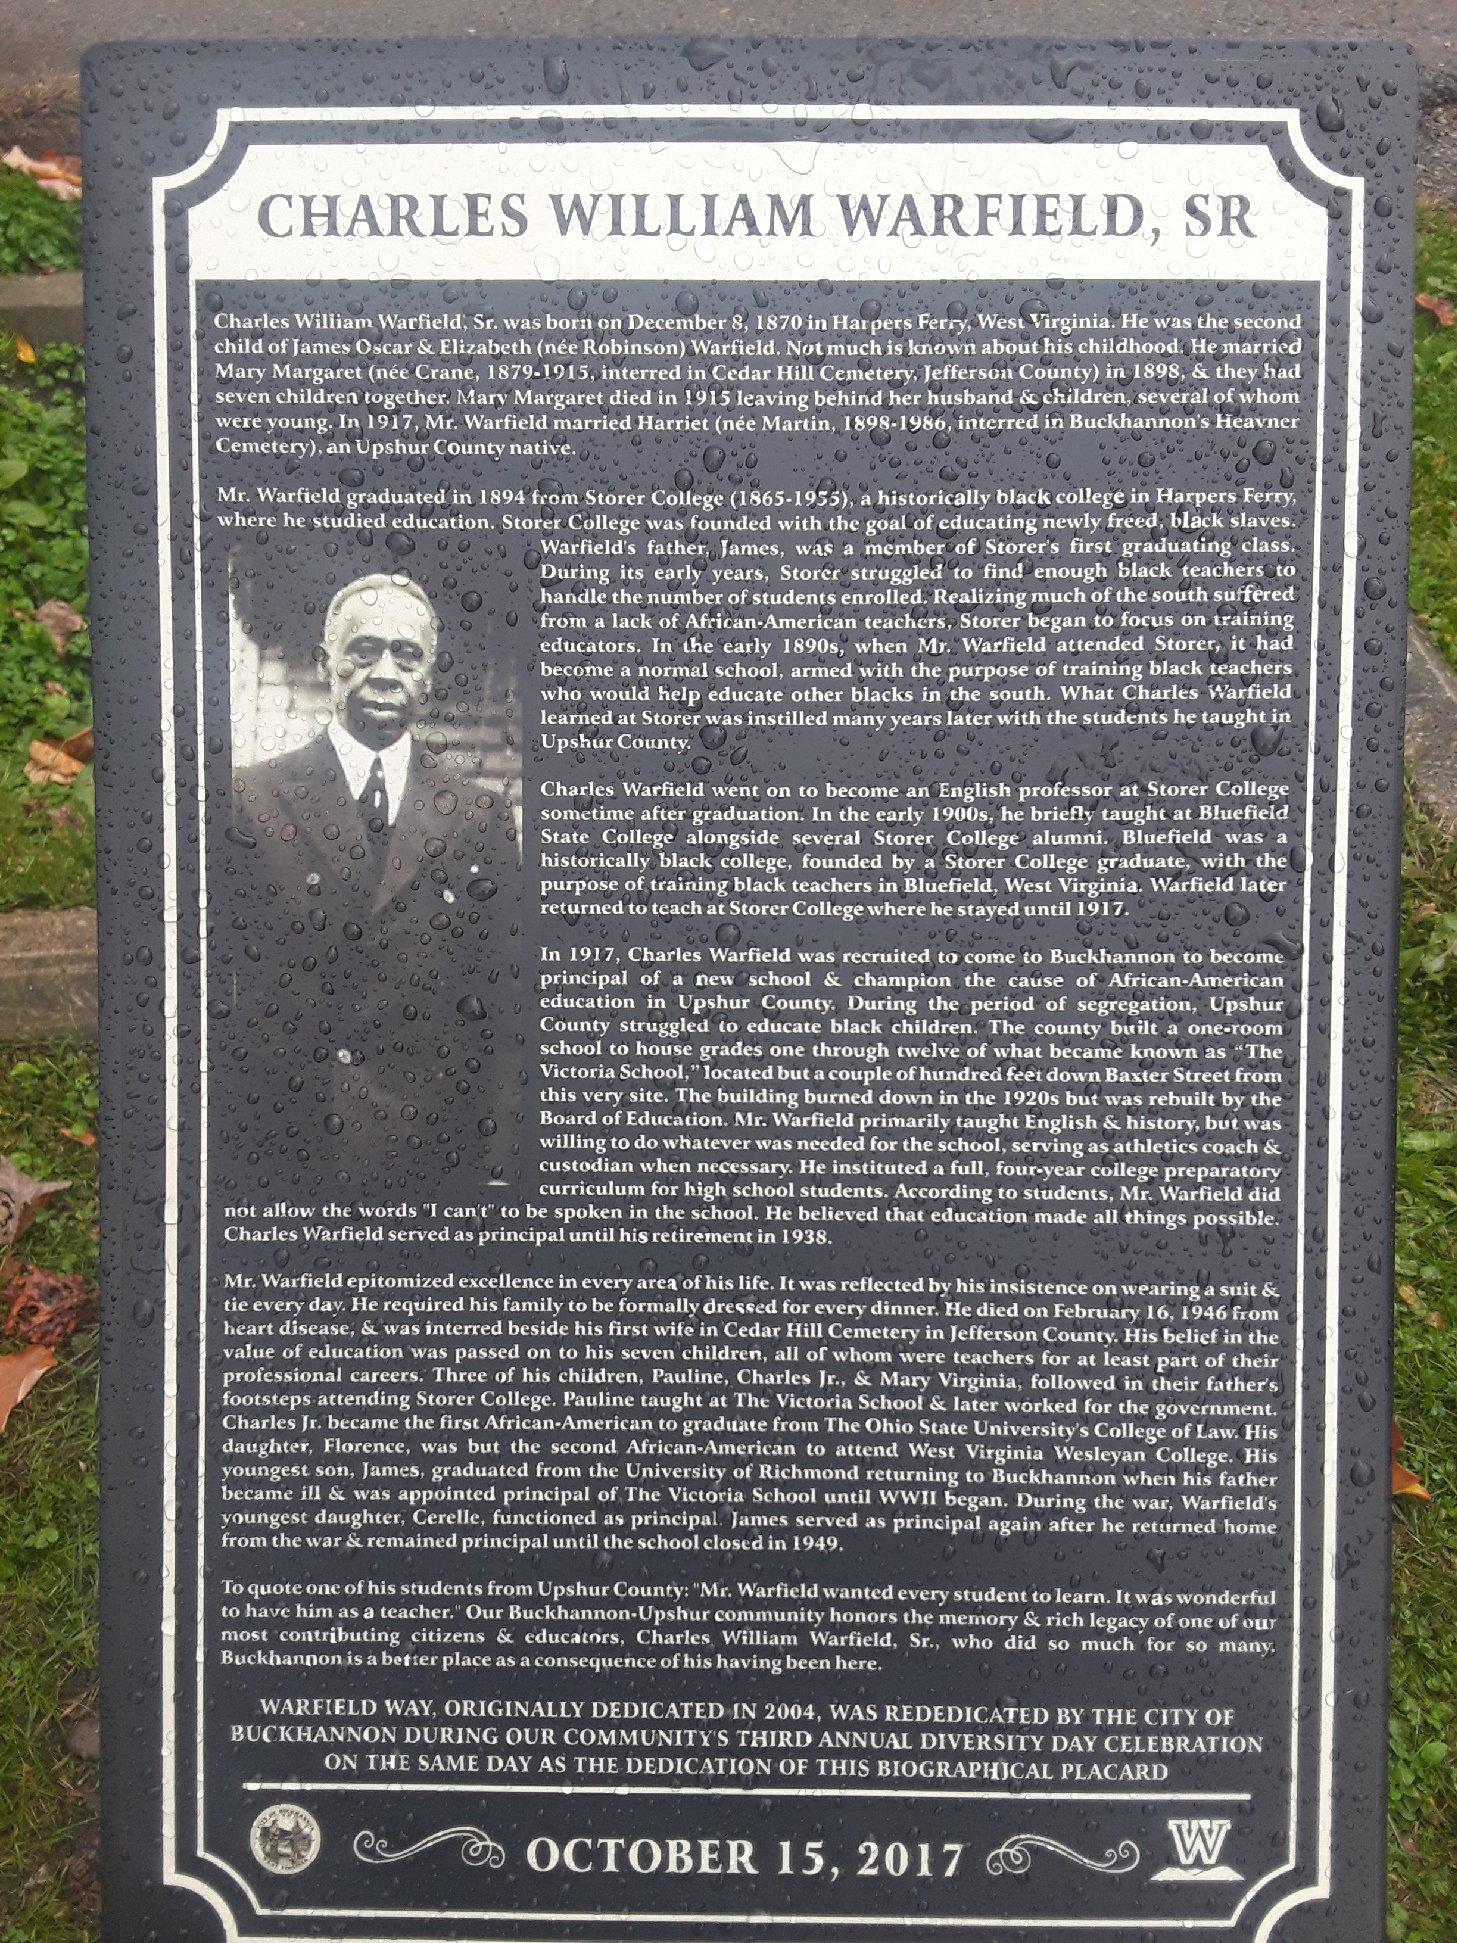 This plaque was dedicated in 2017 during West Virginia Wesleyan's homecoming weekend.